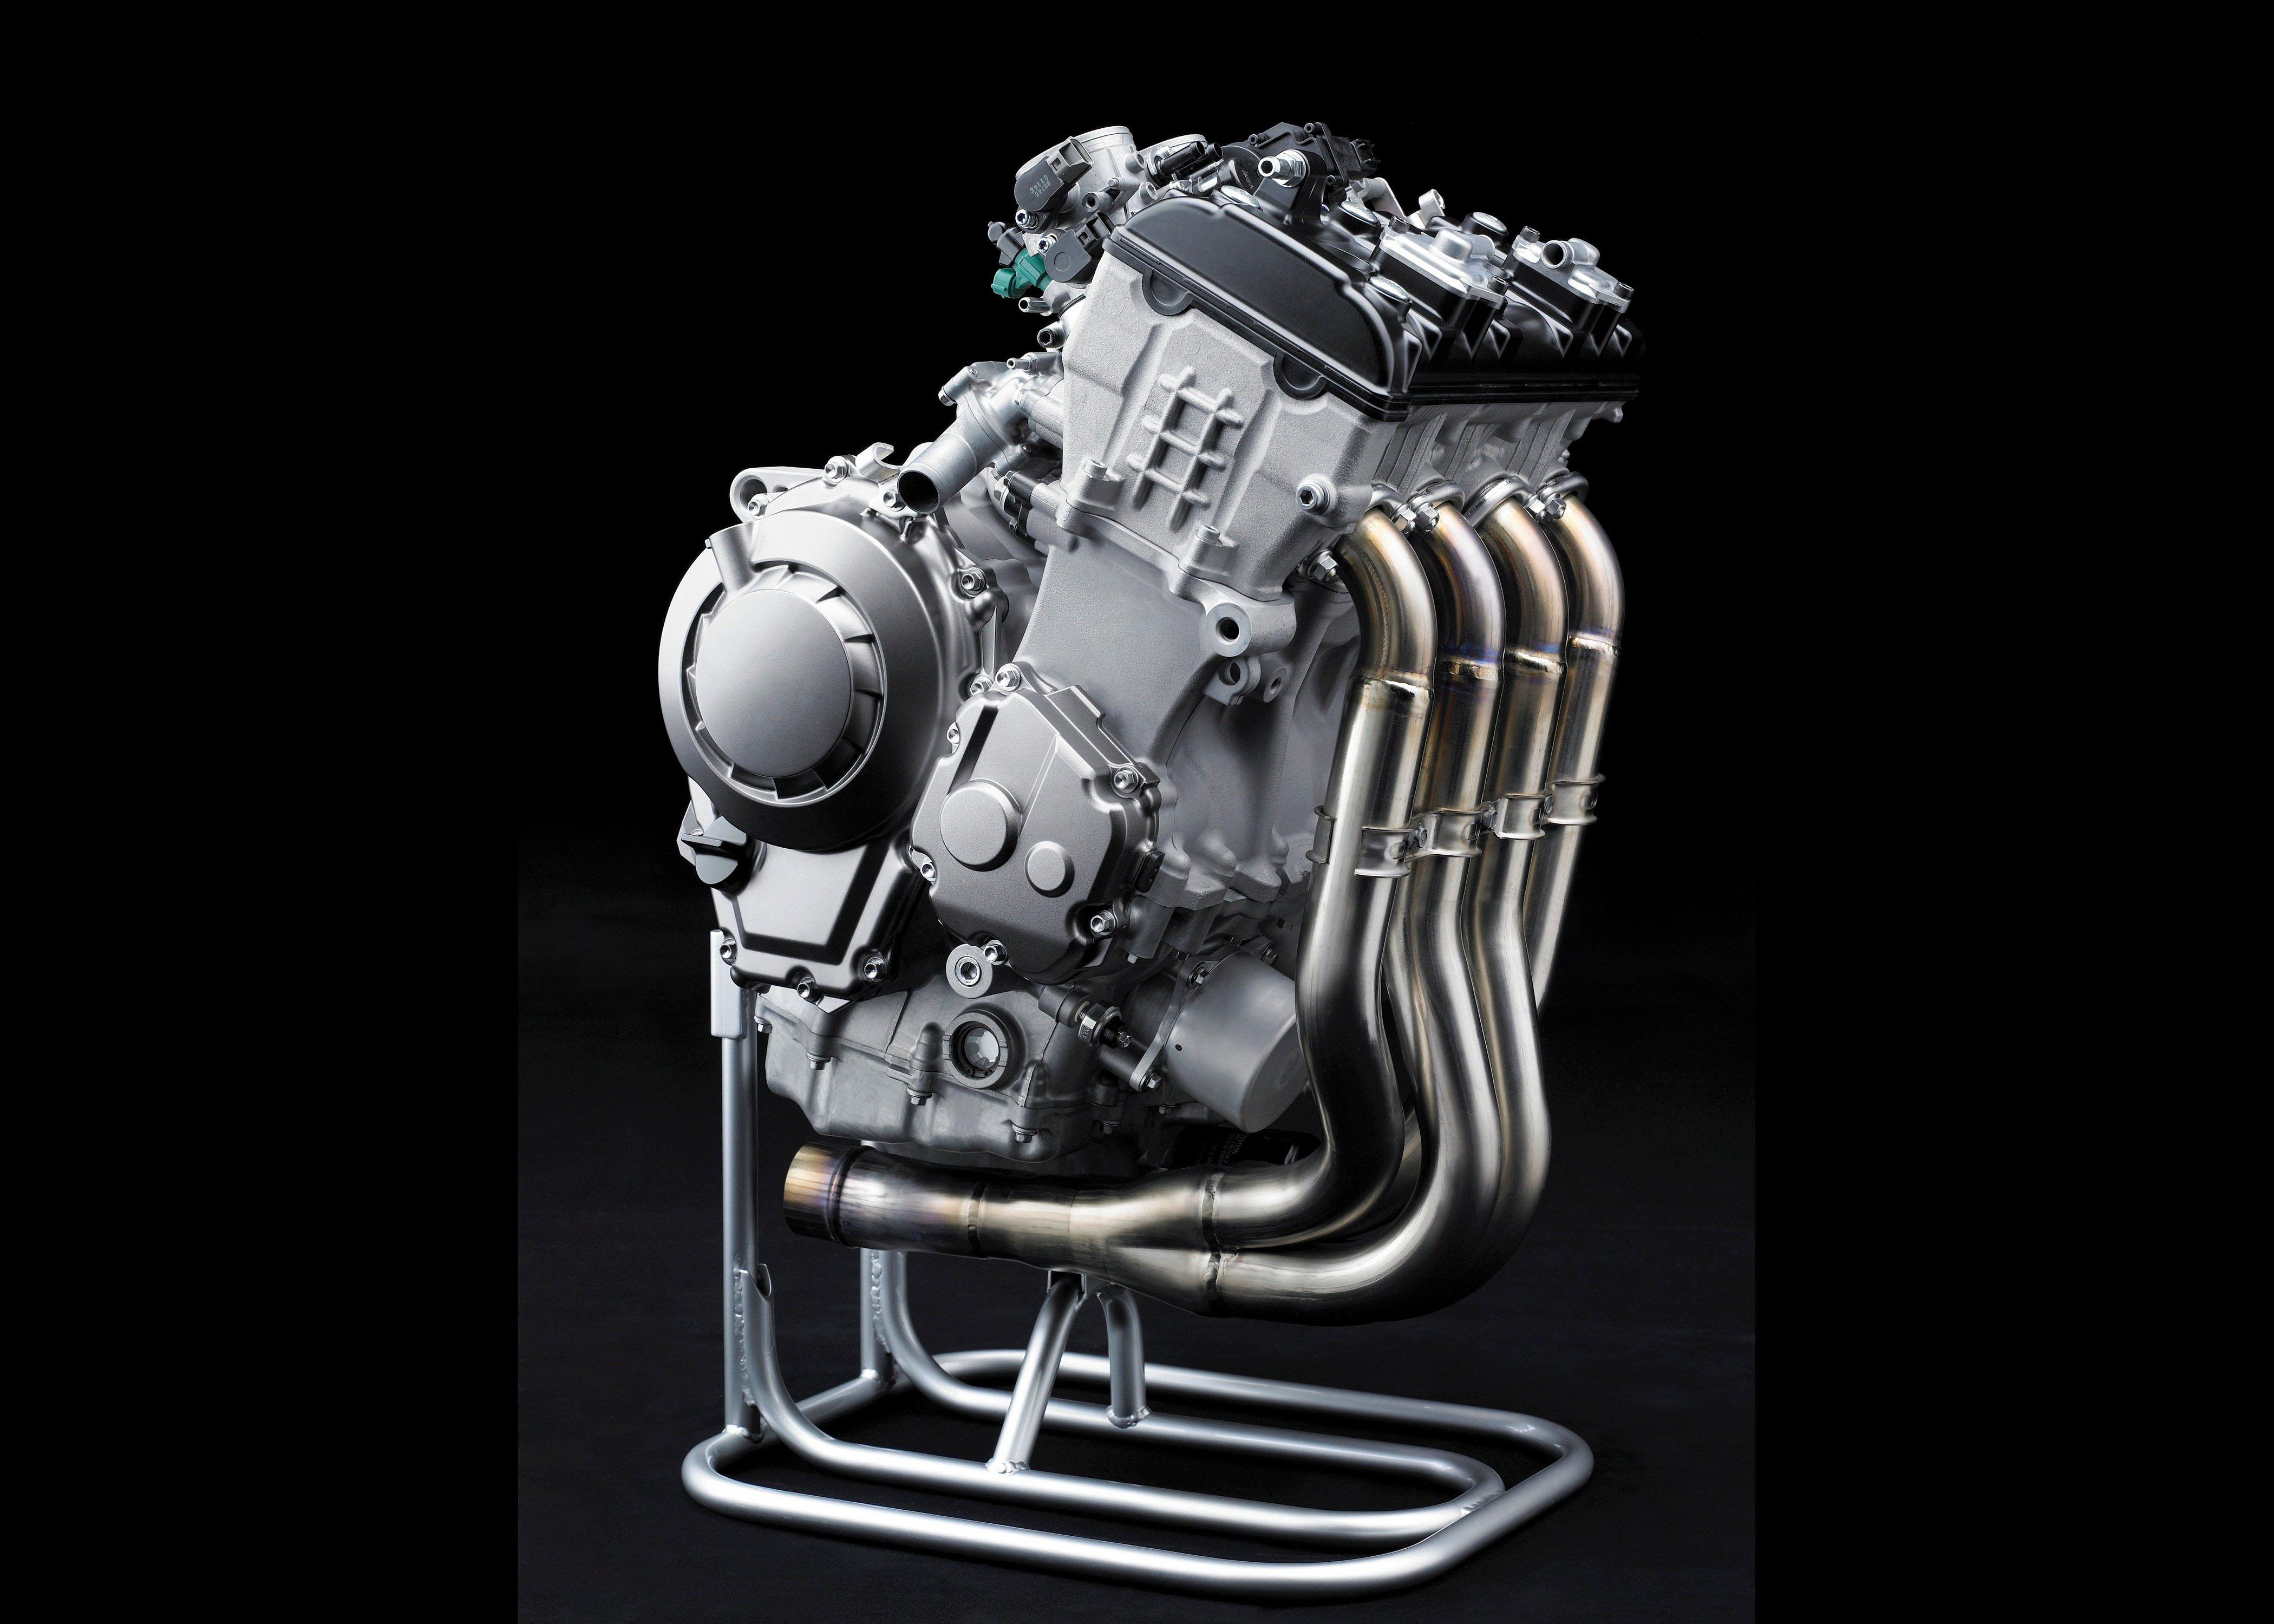 Used Kawasaki Engines